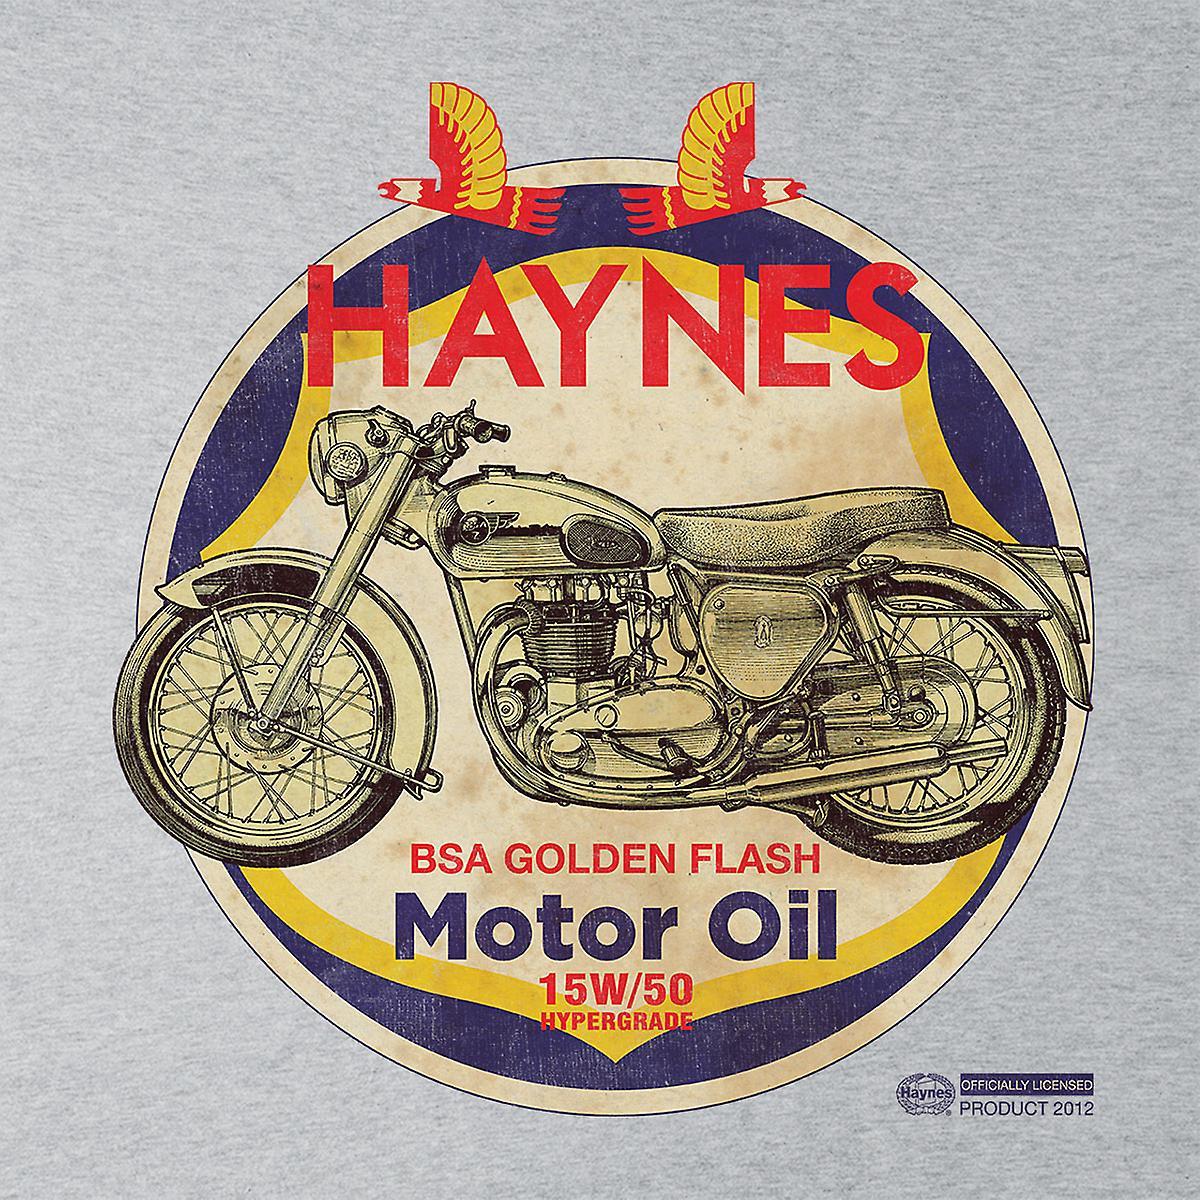 Haynes Brand Richfield BSA Motor Oil Distressed Kid's Varsity Jacket